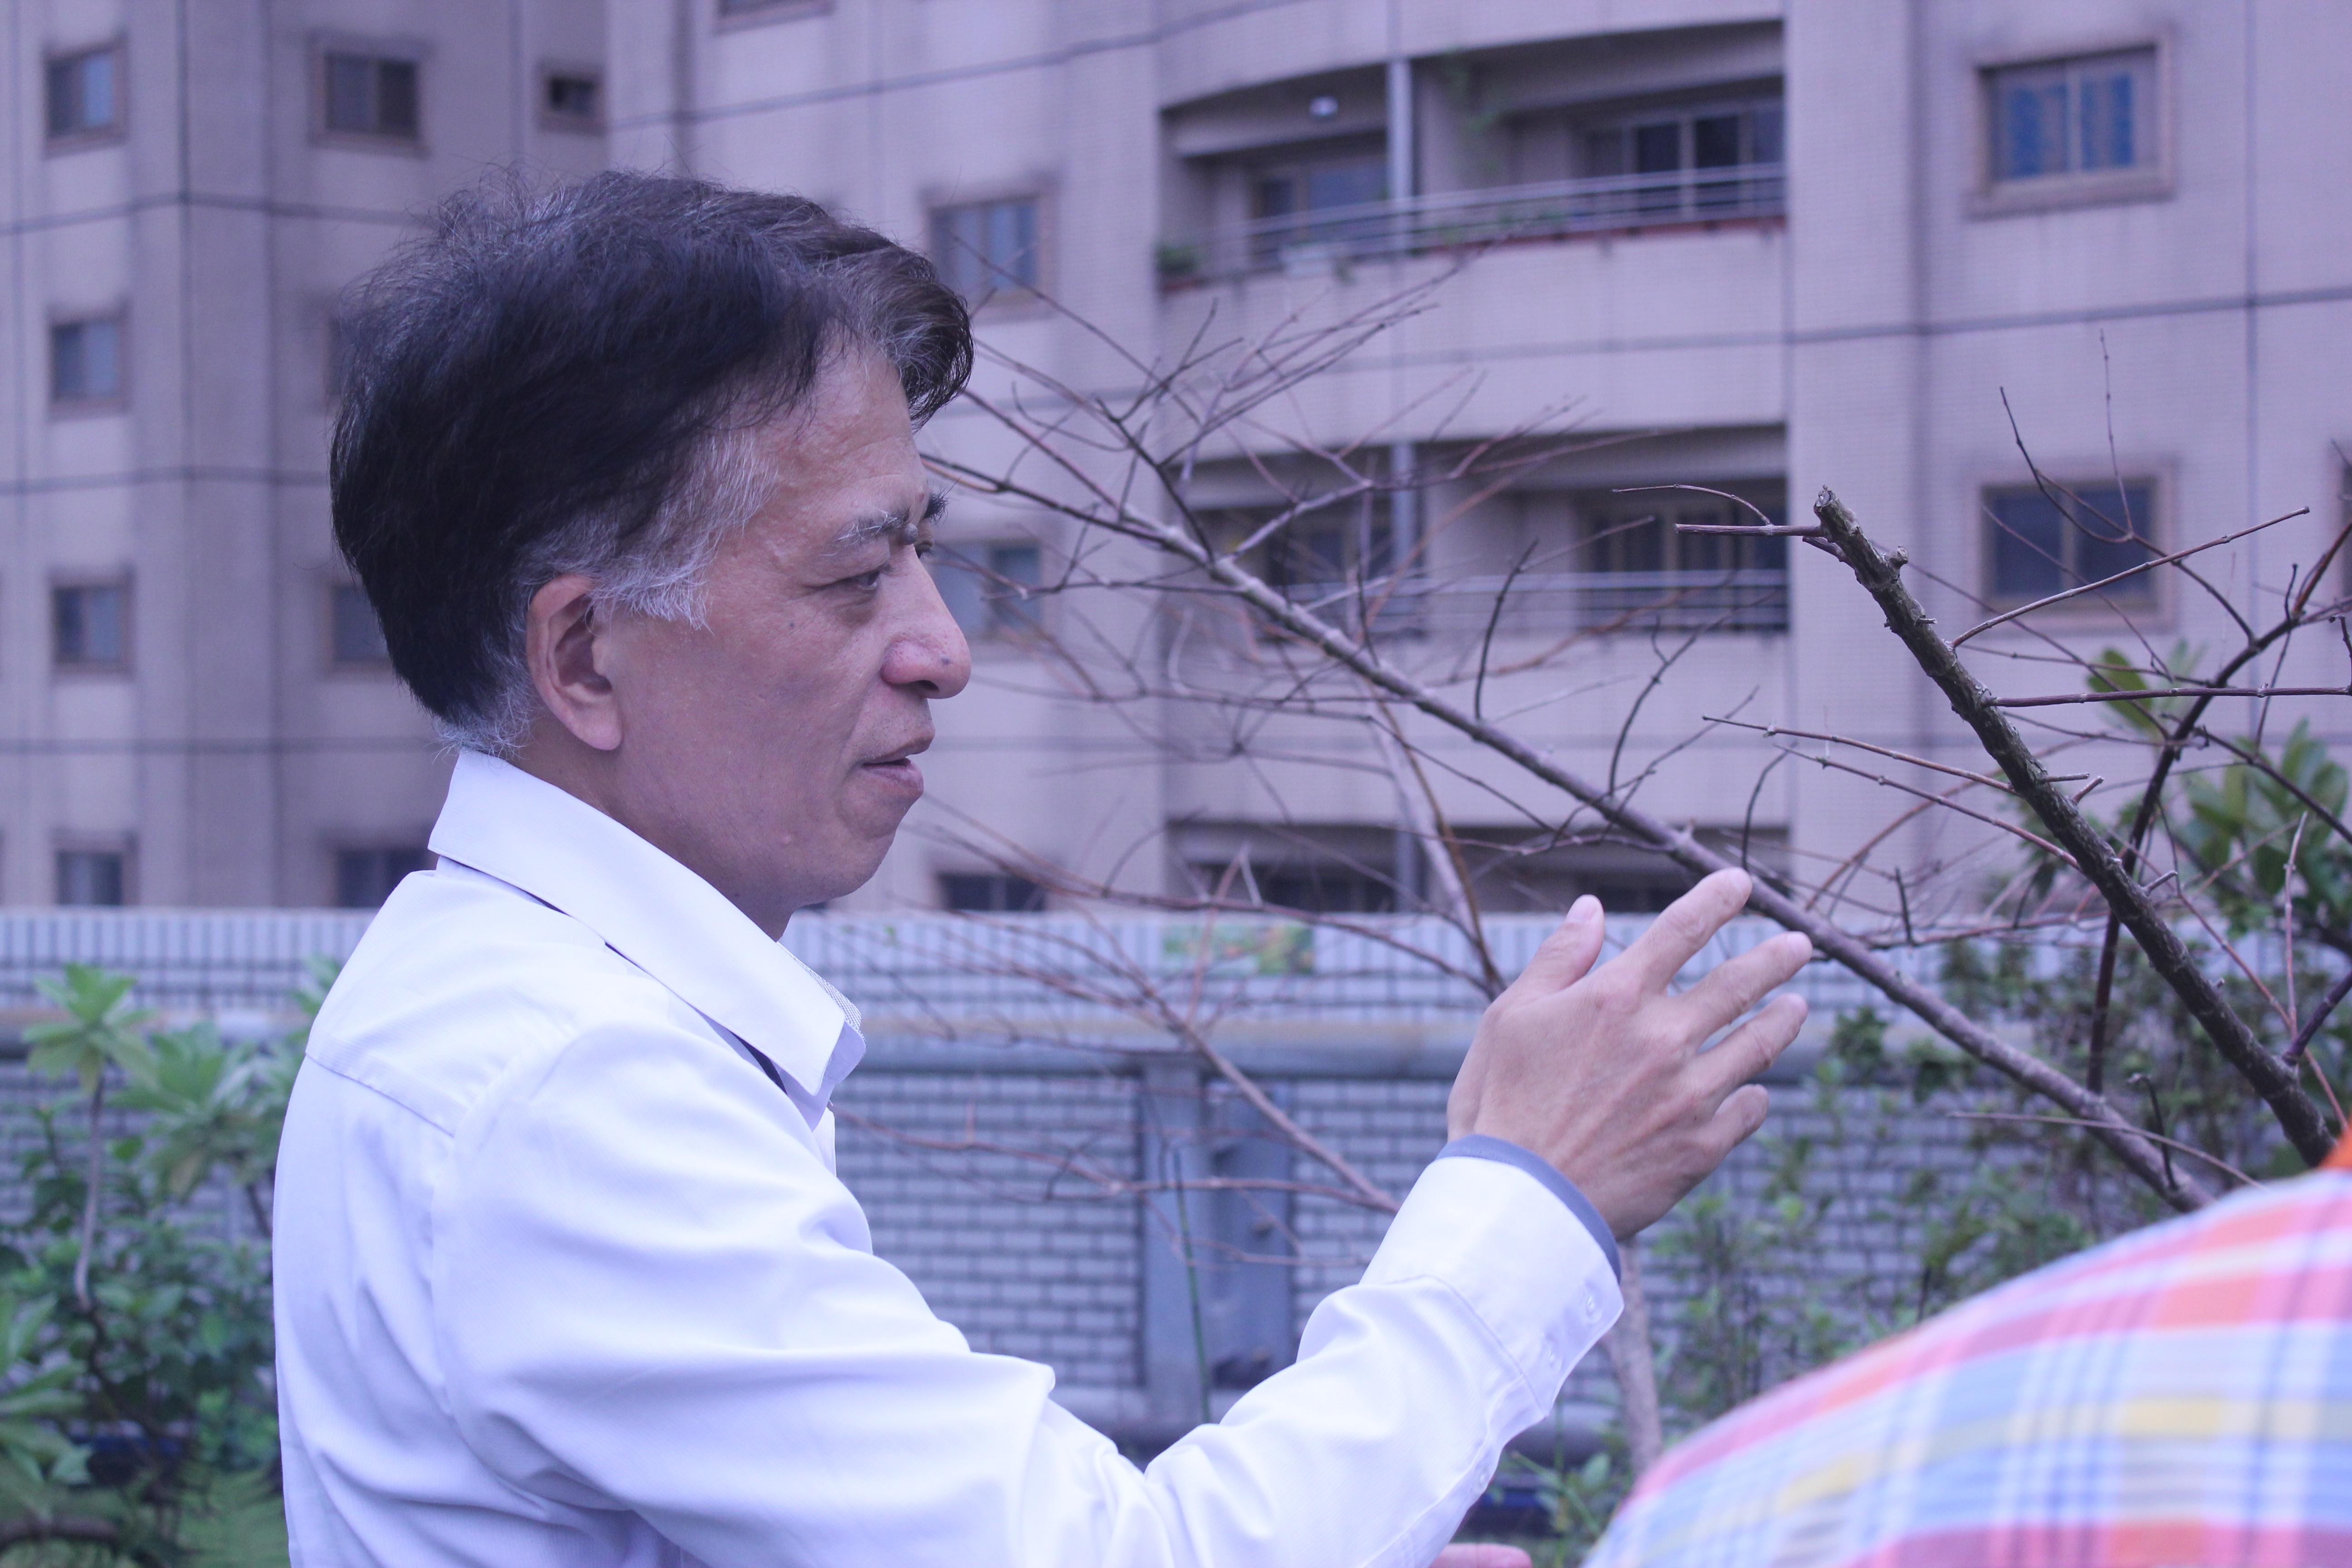 「G-HOME永續生態屋頂」設置計畫負責人技嘉科技永續發展辦公室處長朱福政。攝影/蔡家愷